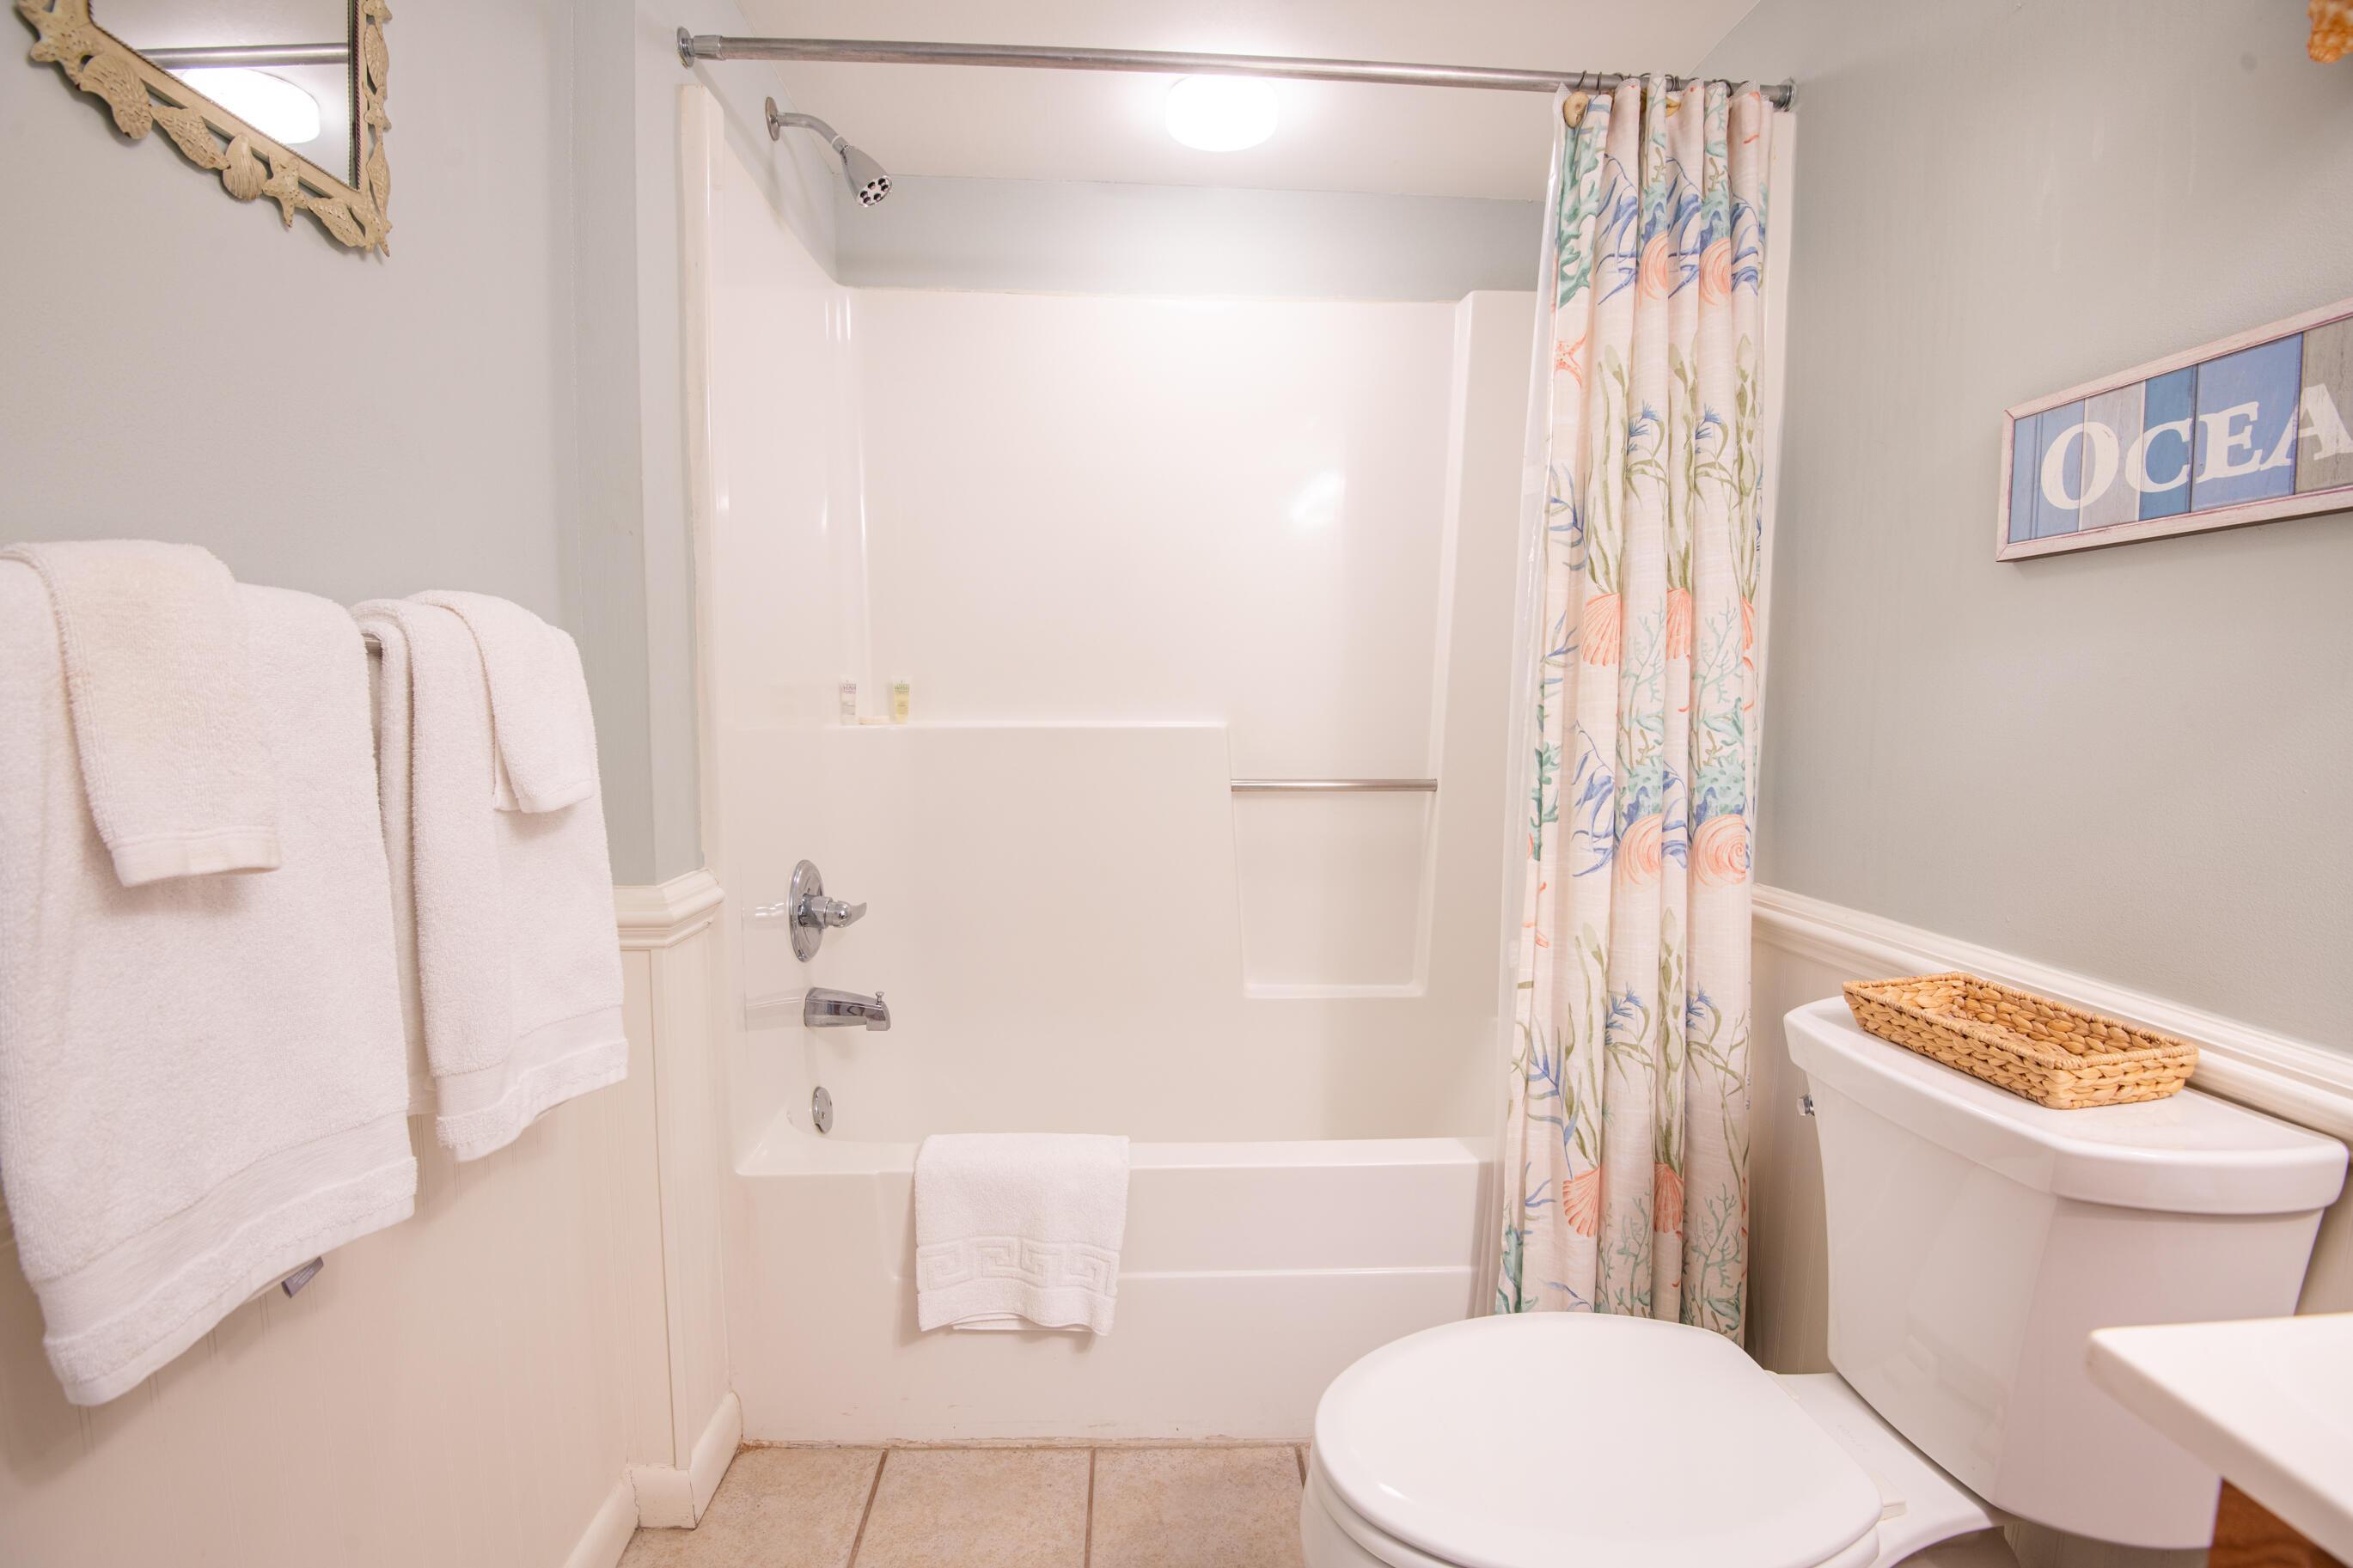 Atrium Villas Homes For Sale - 2935 Atrium Villa, Seabrook Island, SC - 33